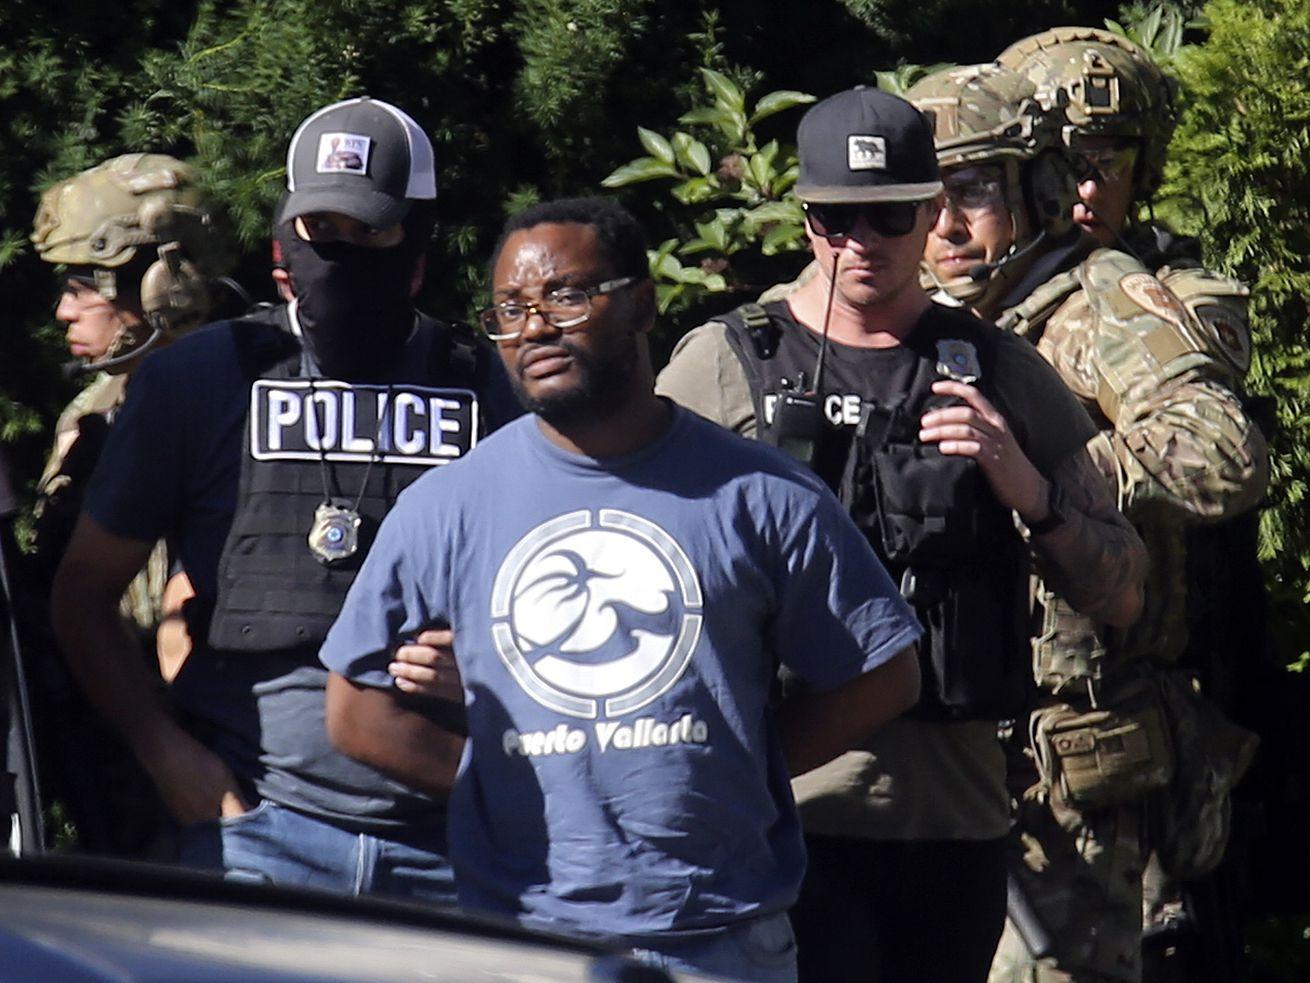 Salt Lake police take Ayoola Adisa Ajayi into custody in Salt Lake City on Friday, June 28, 2019. Ajayi, 31, is accused of murdering University of Utah student Mackenzie Lueck.